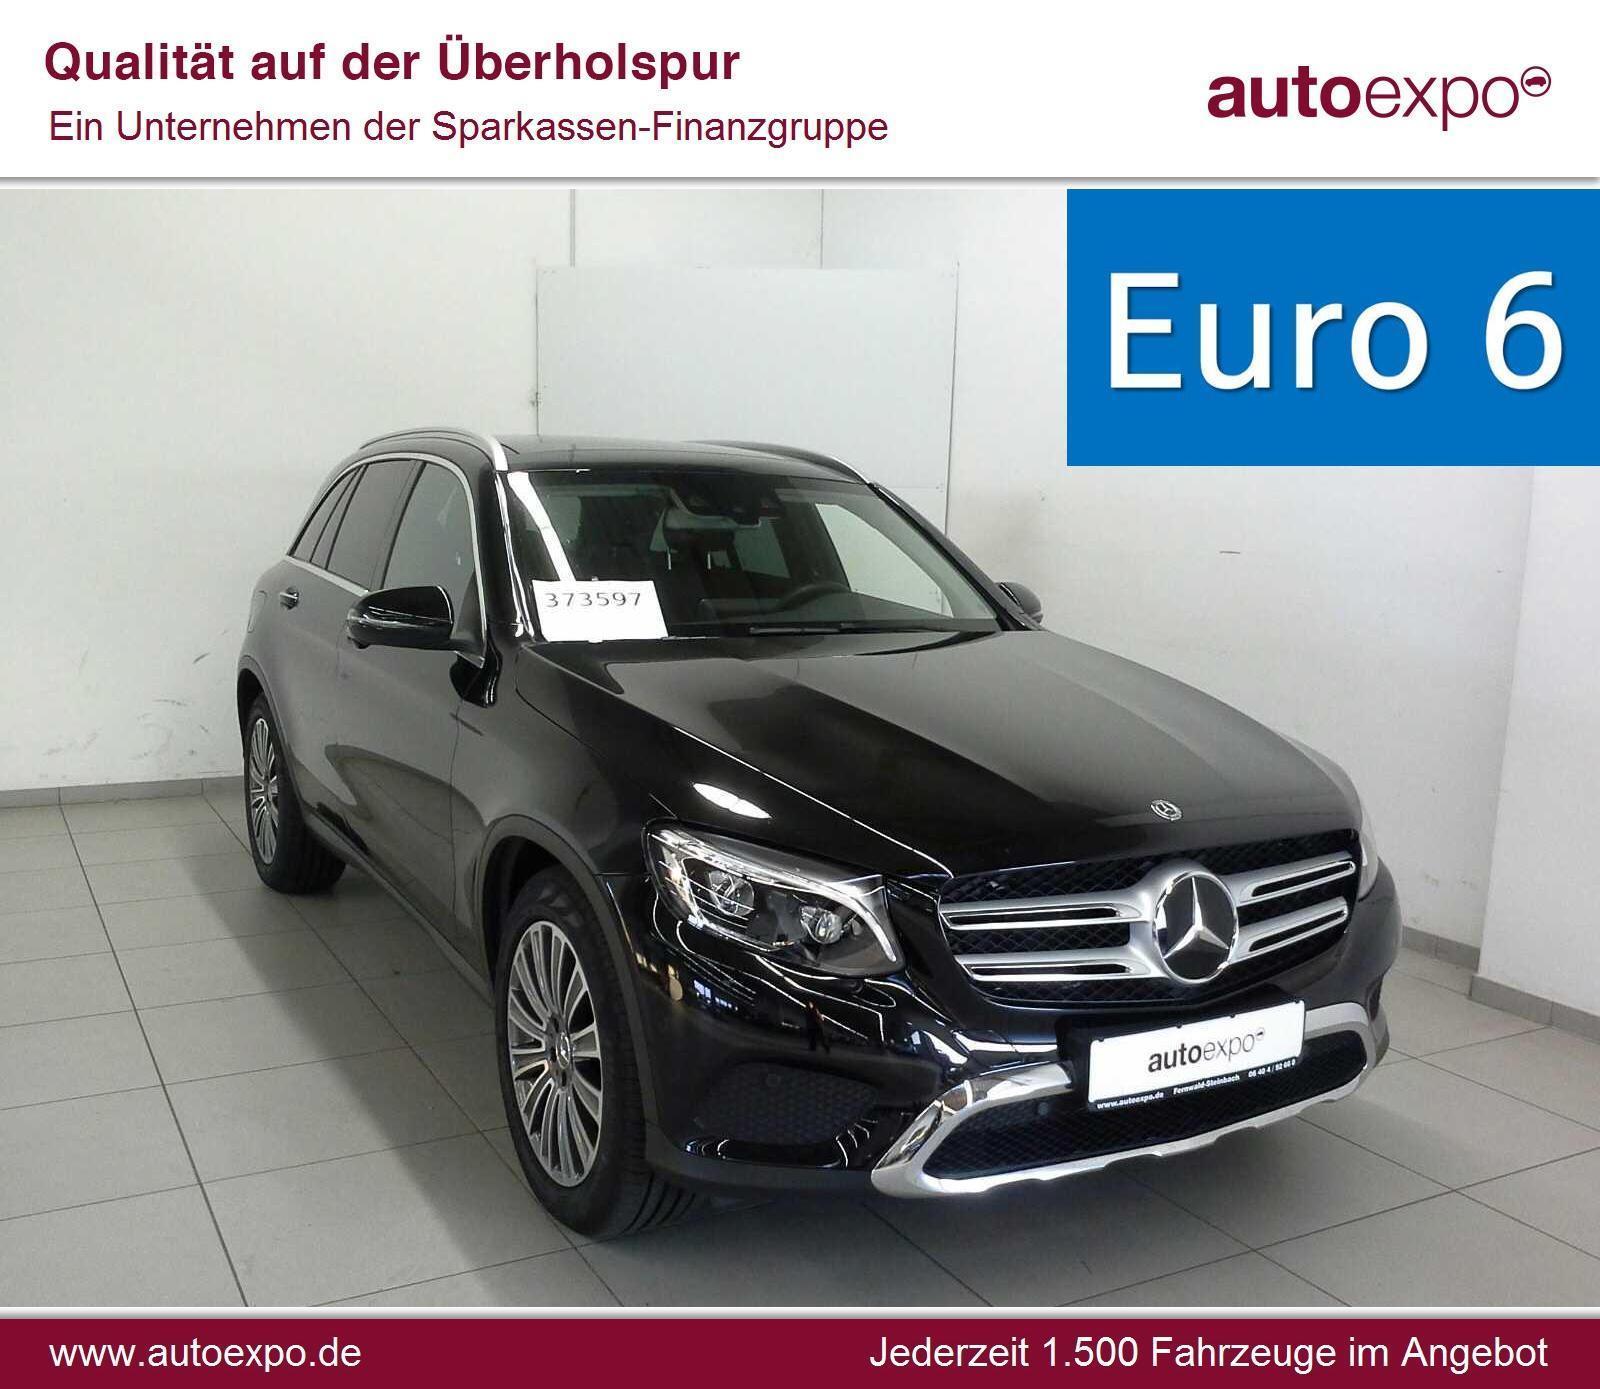 Mercedes Benz Glc 350 D 4matic 9g Tronic Exclusive Deine Autobörse